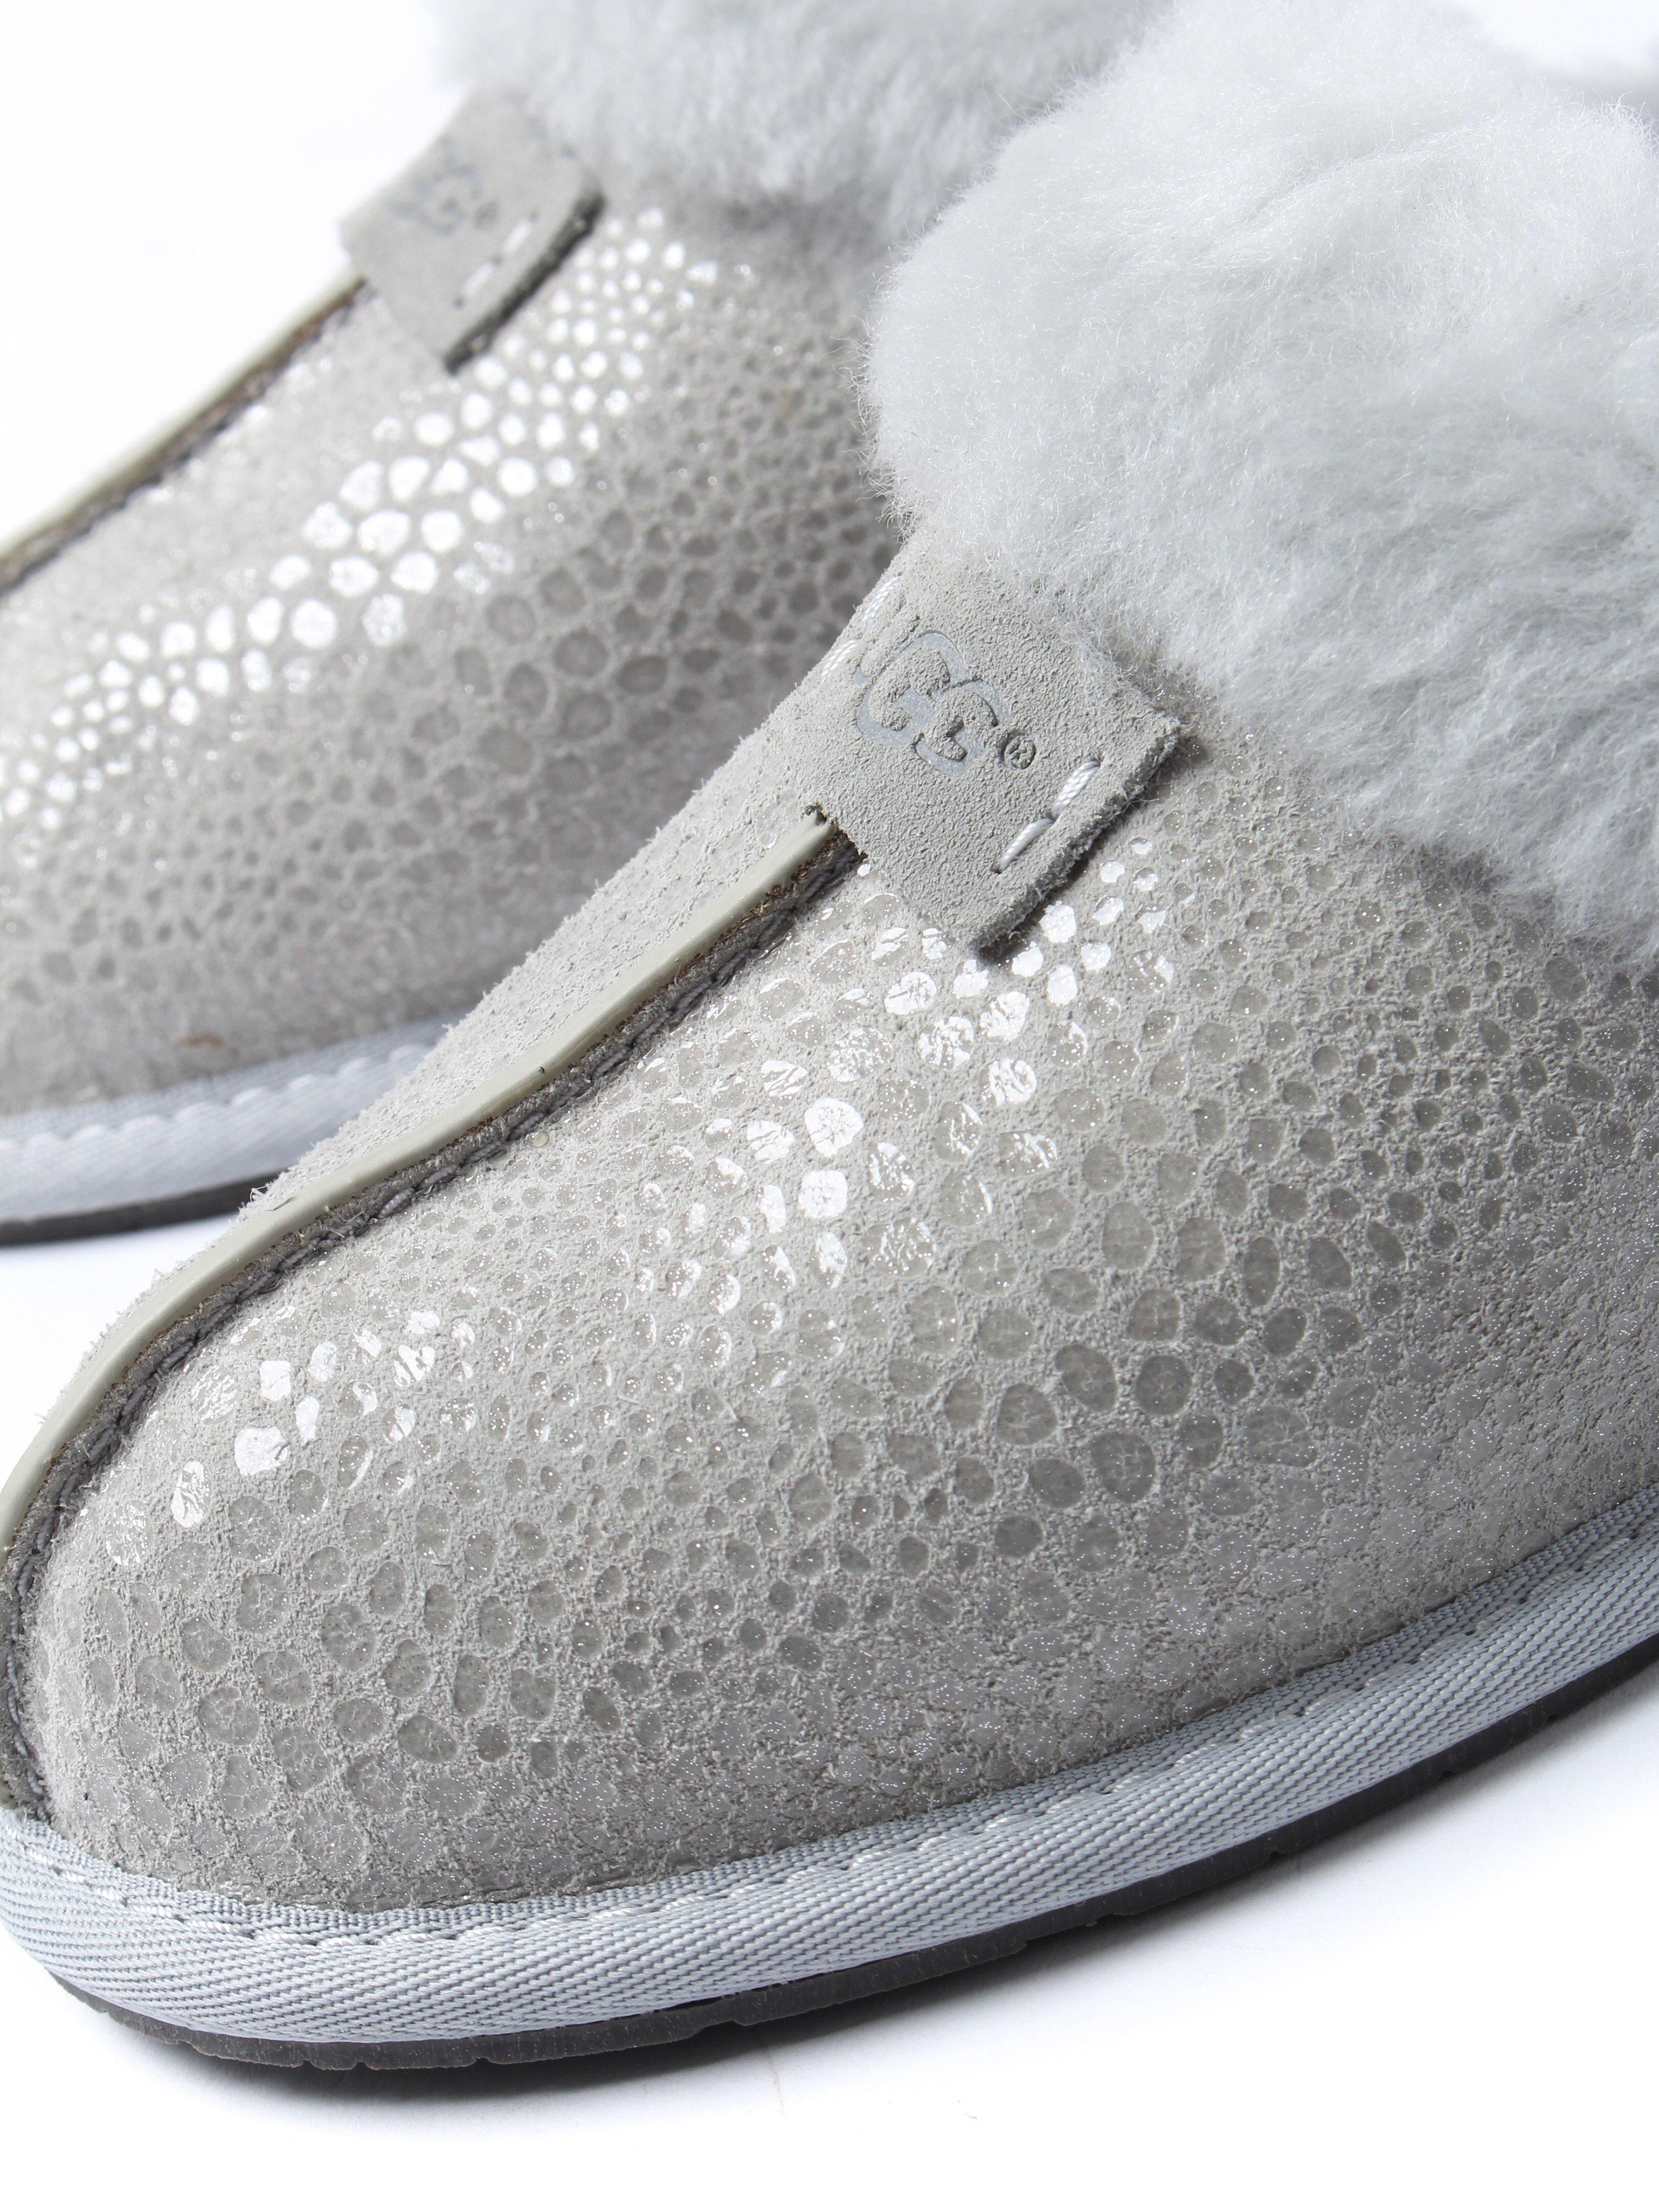 UGG Women's Scuffette II Glitzy Slippers - Grey Violet